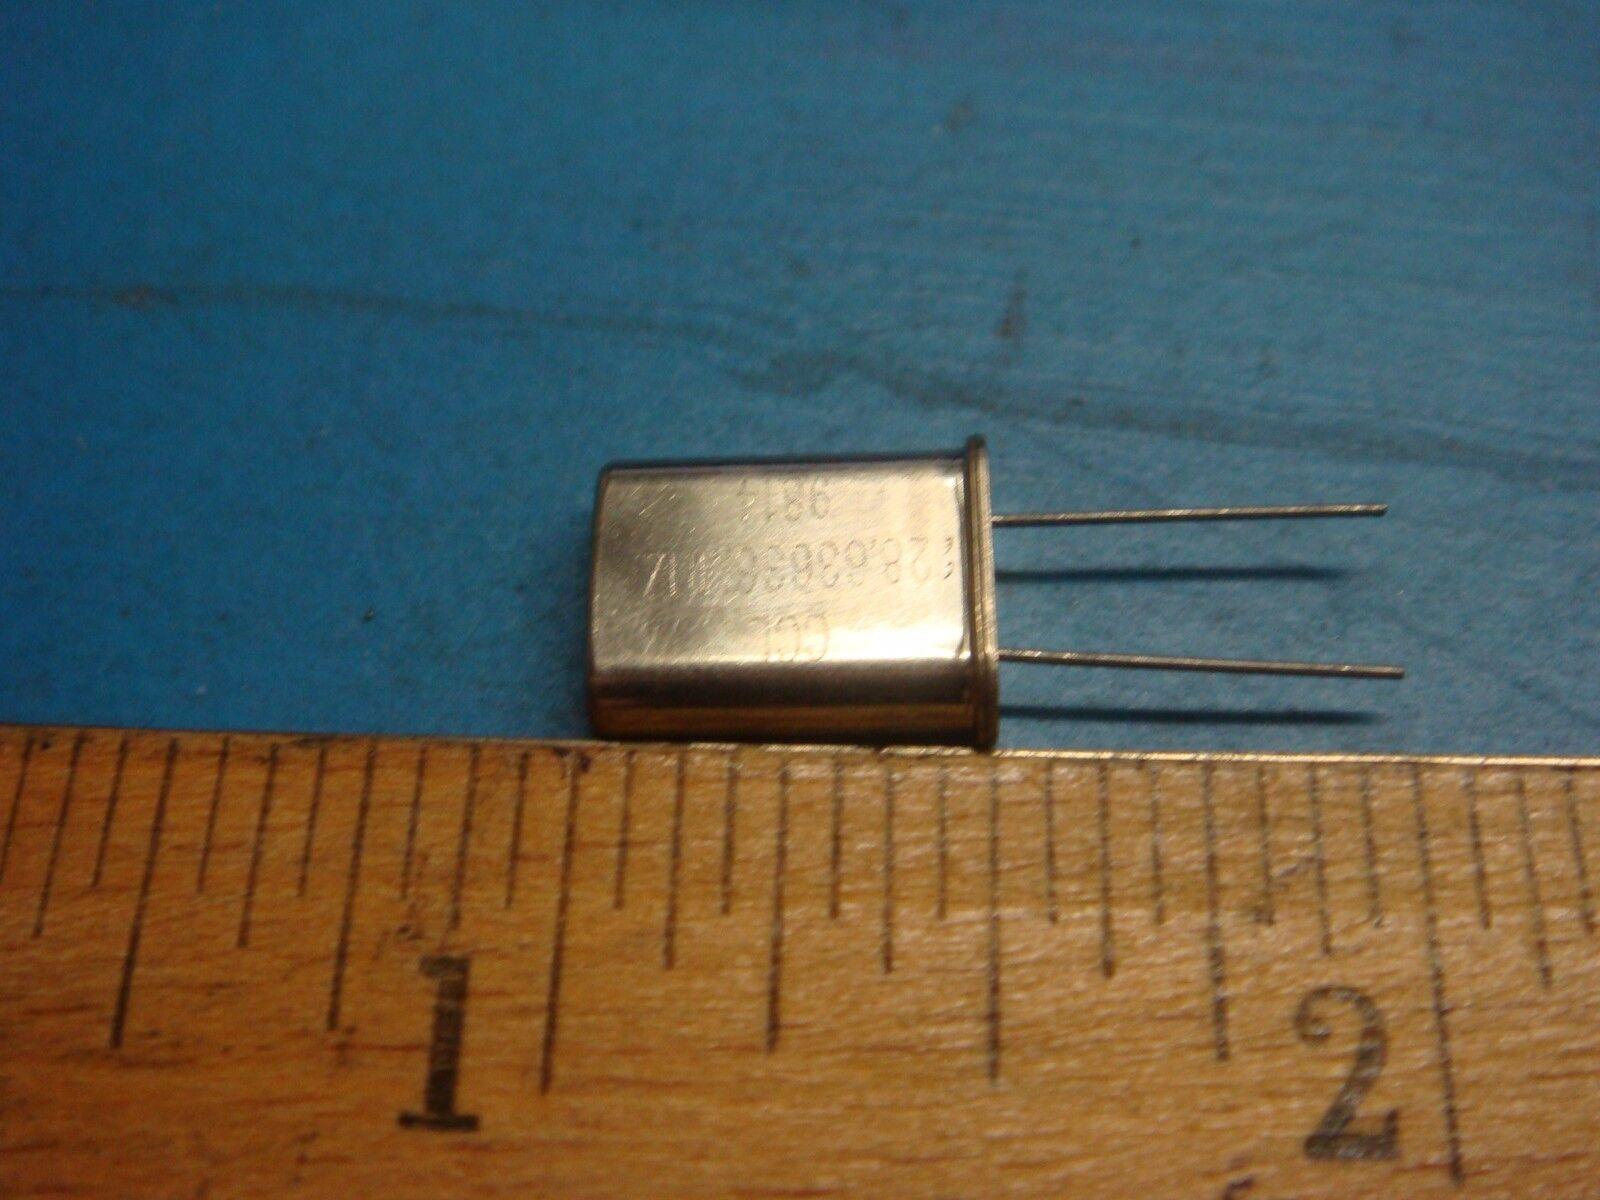 70C 5 pieces Standard Clock Oscillators 7.3728MHz 50ppm 20C